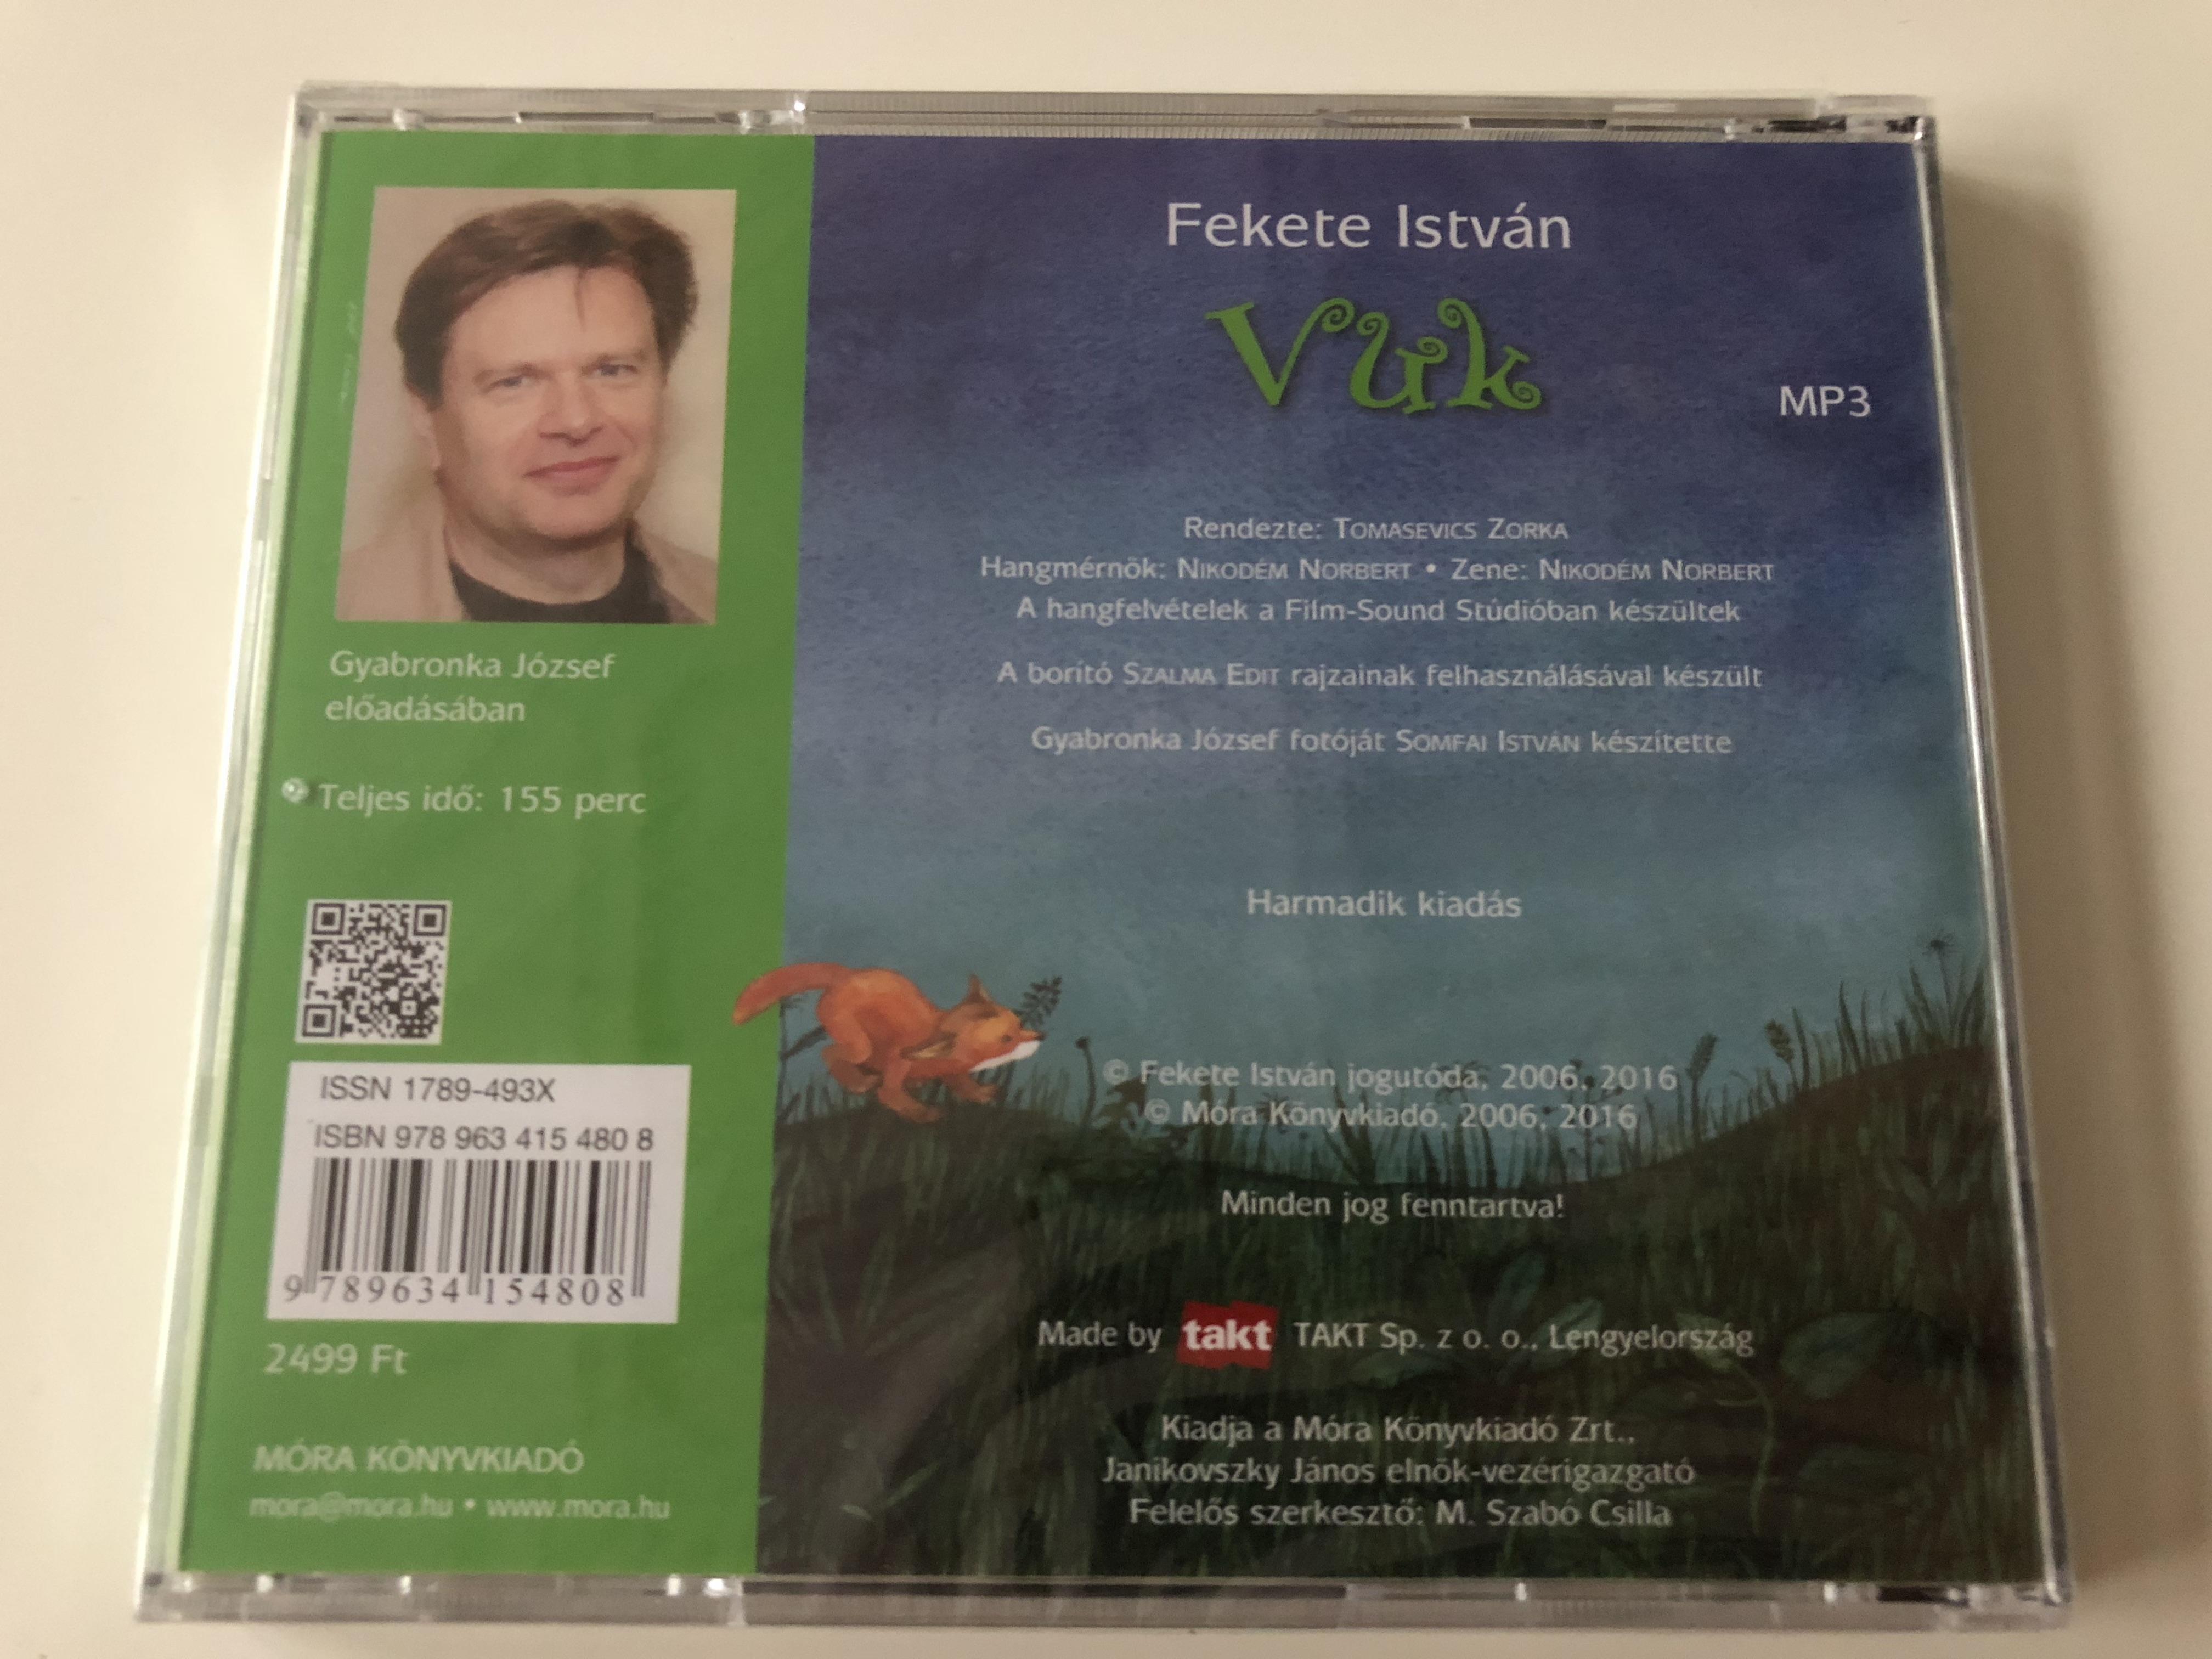 vuk-by-fekete-istv-n-hungarian-language-mp3-audio-book-vuk-the-fox-cub-read-by-gyabronka-j-zsef-m-ra-k-nyvkiad-2016-2-.jpg